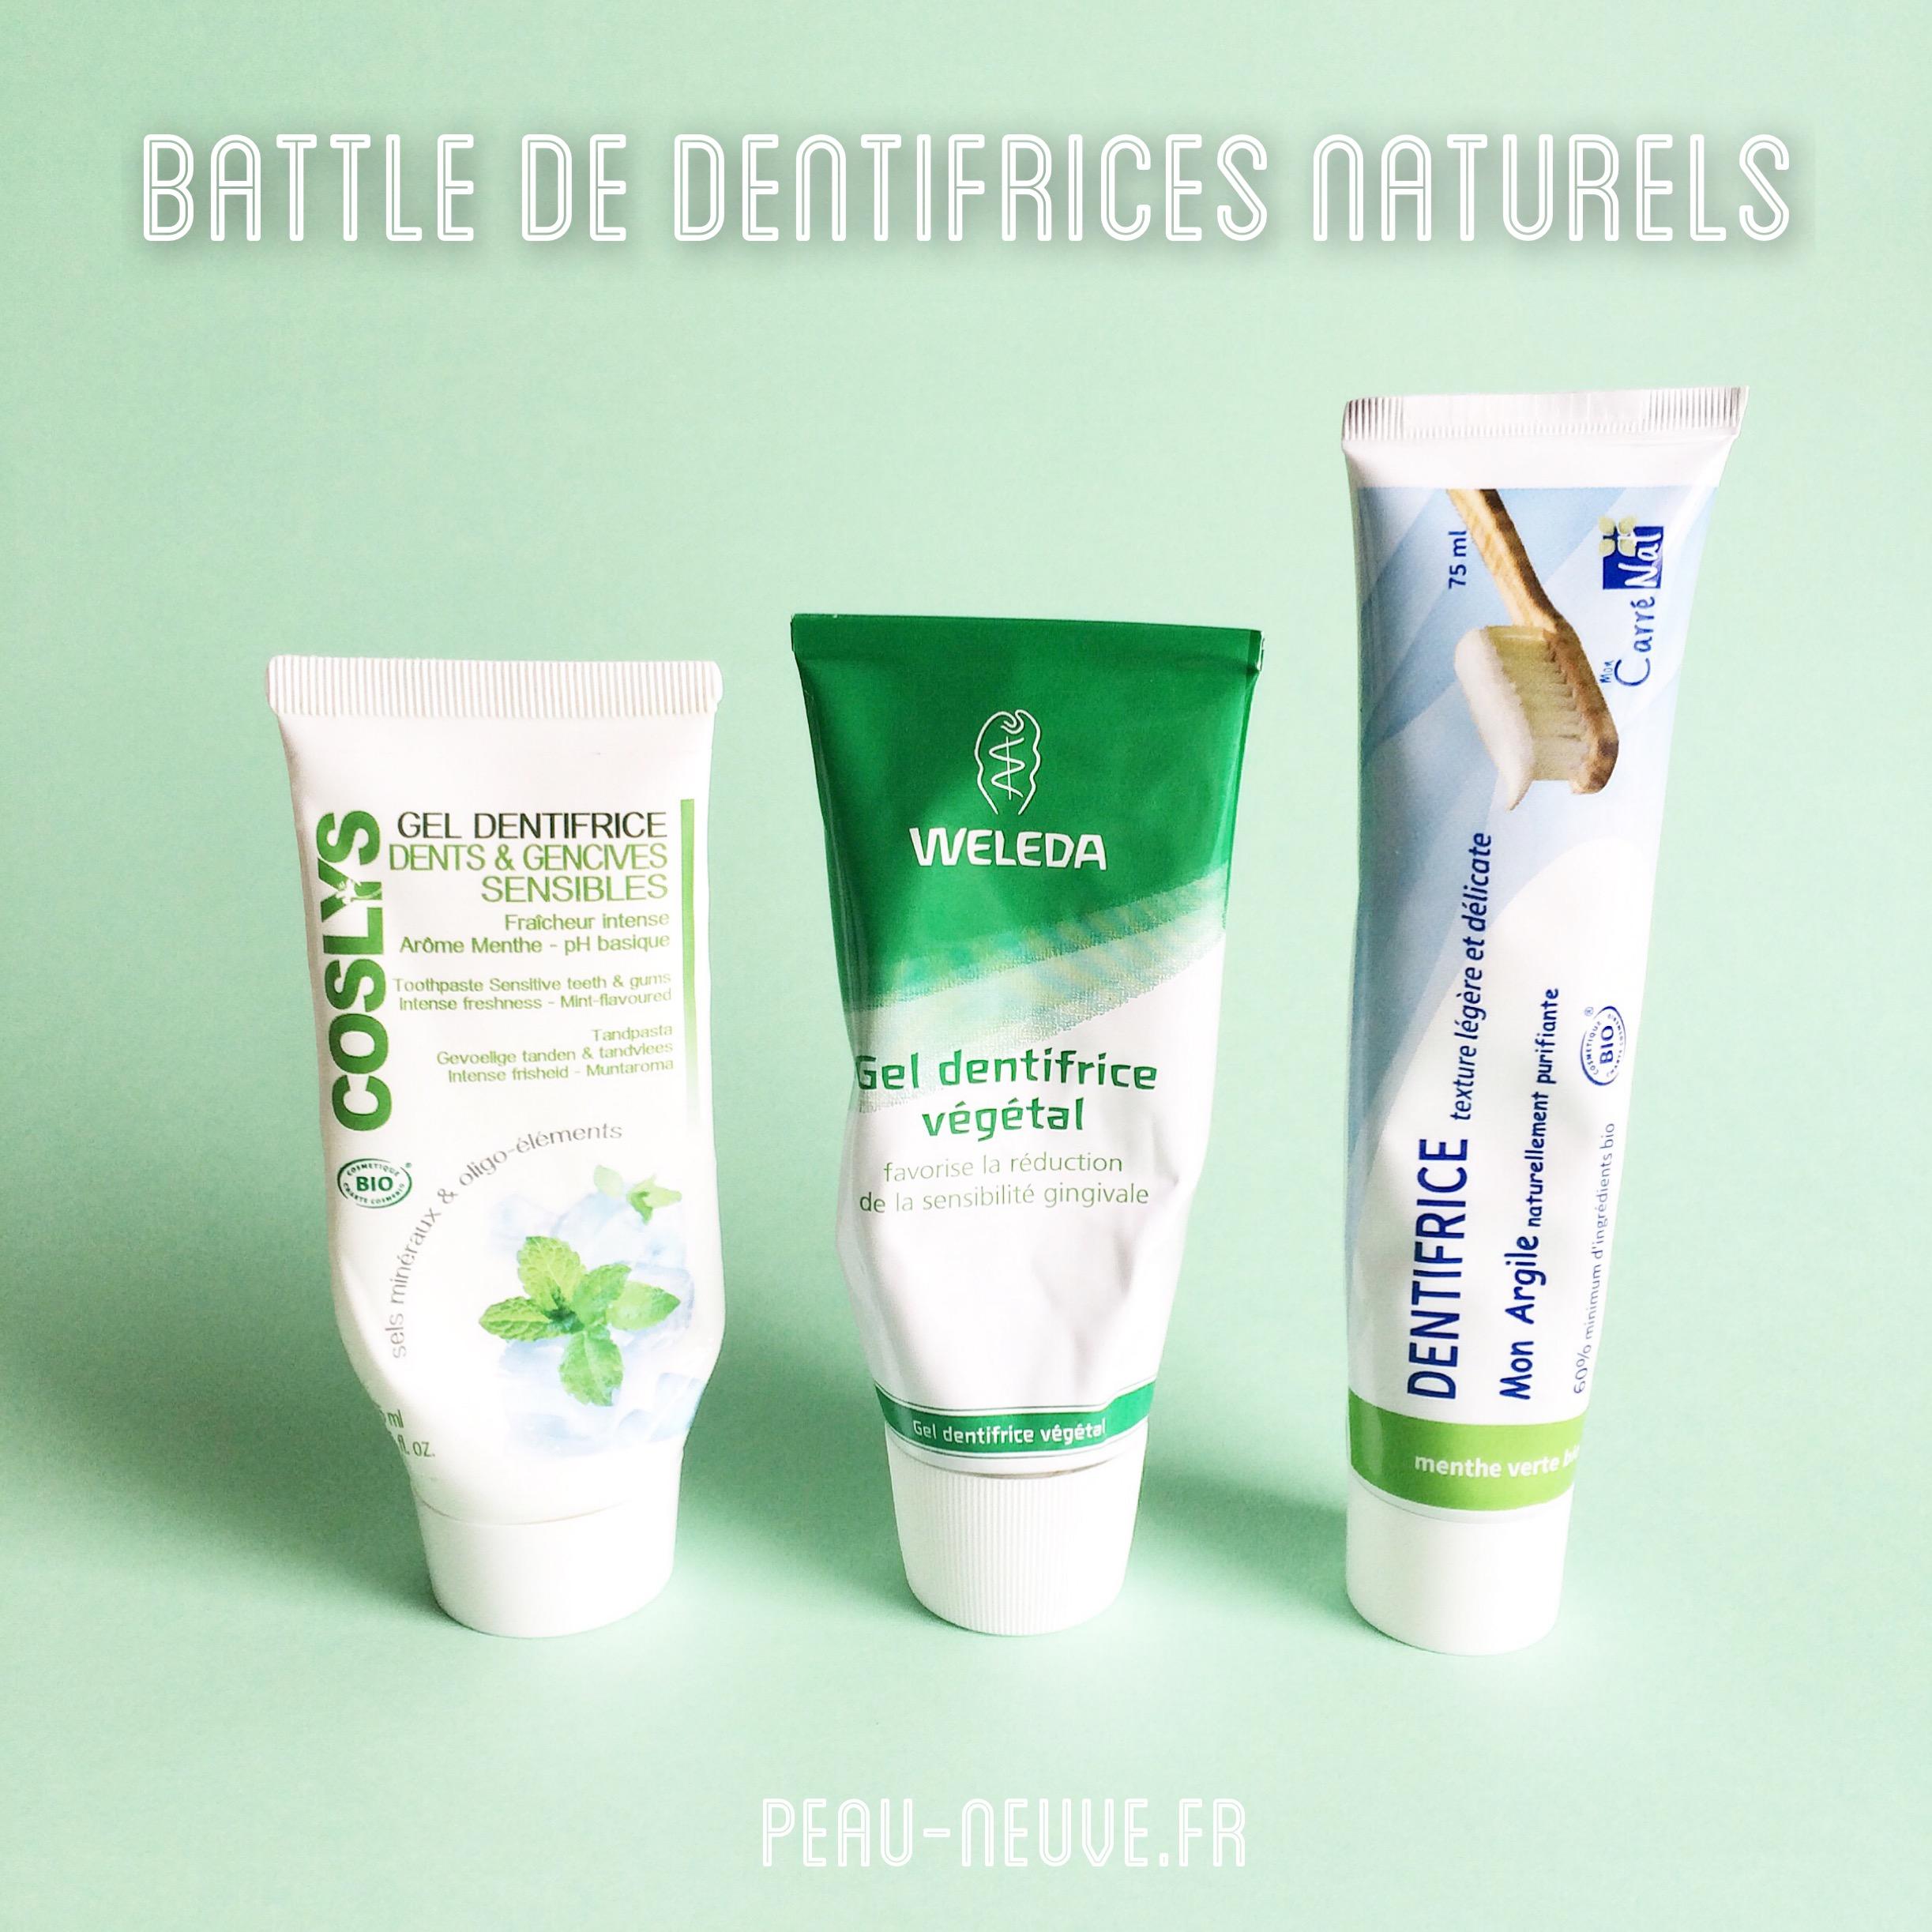 BATTLE DE DENTIFRICES NATURELS